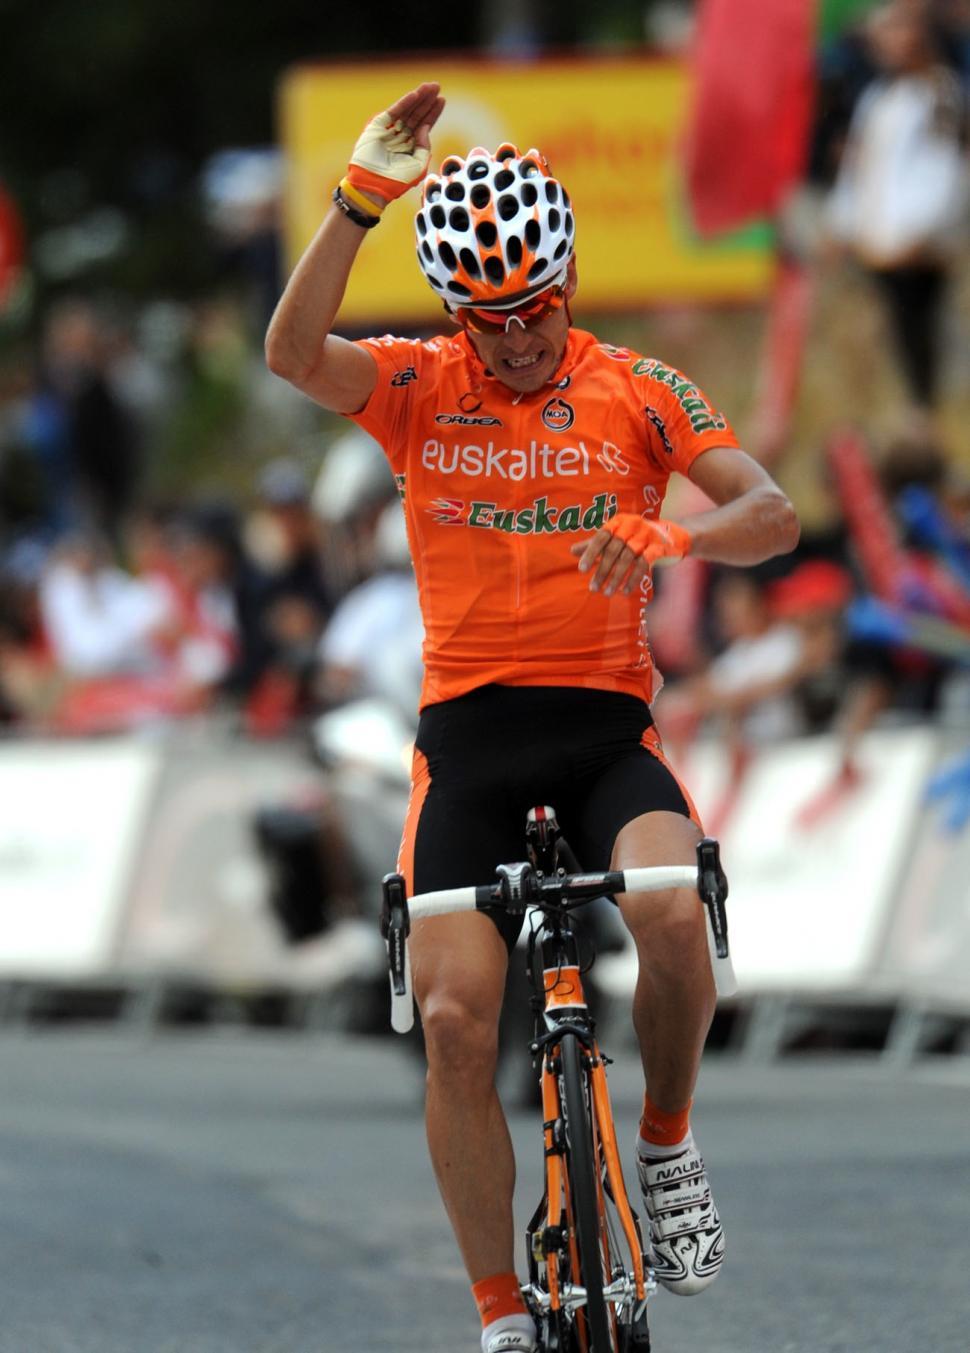 Igor Anton wins Stage 11 of the 2010 Vuelta (copyright Unipublic:Graham Watson)